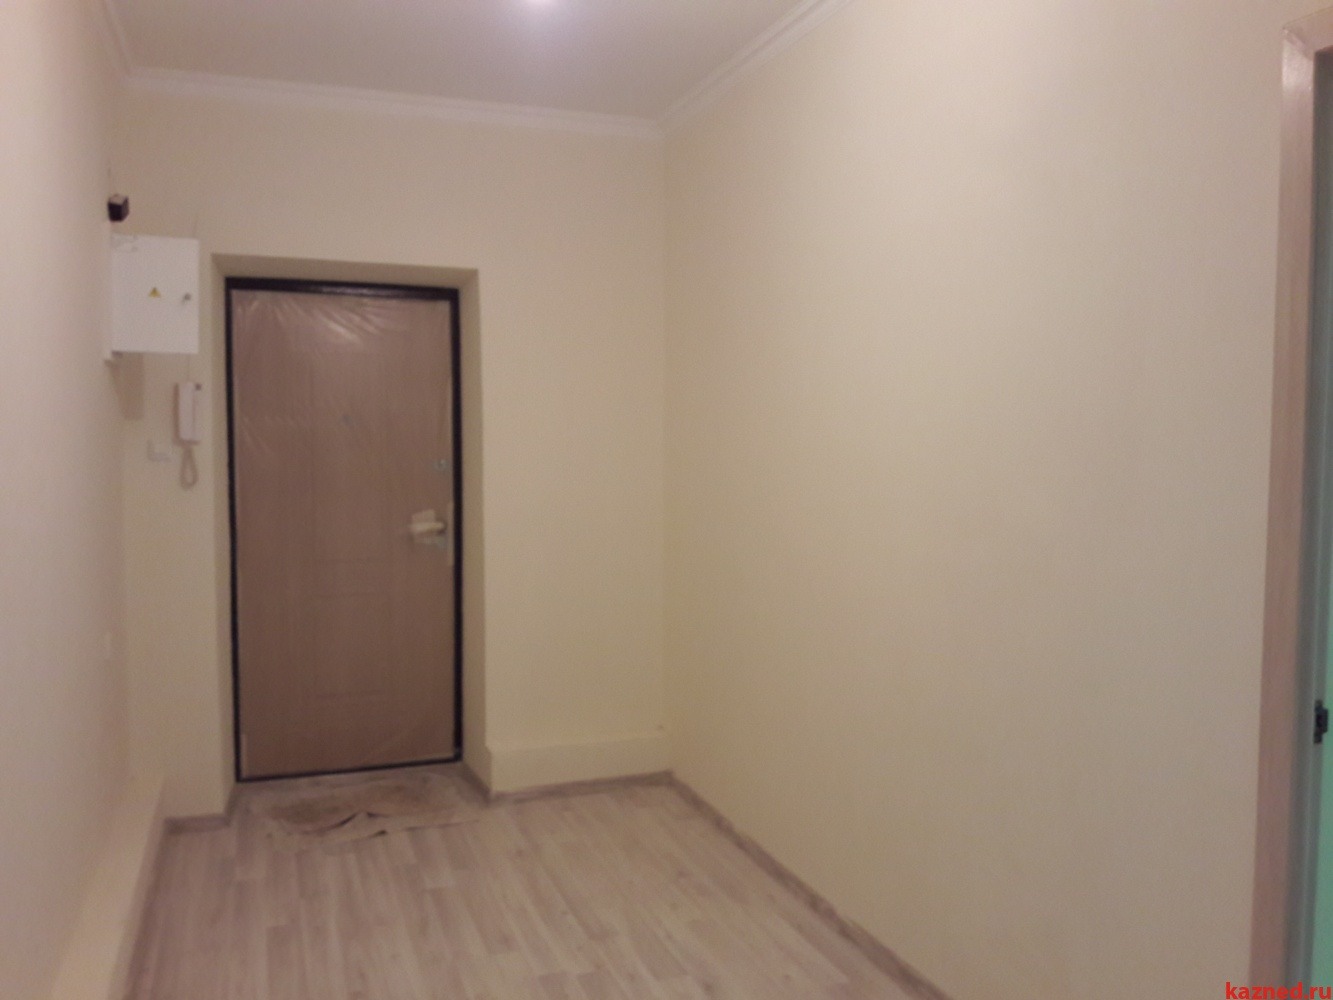 Продажа 3-к квартиры Карбышева,  67, 120 м2  (миниатюра №2)